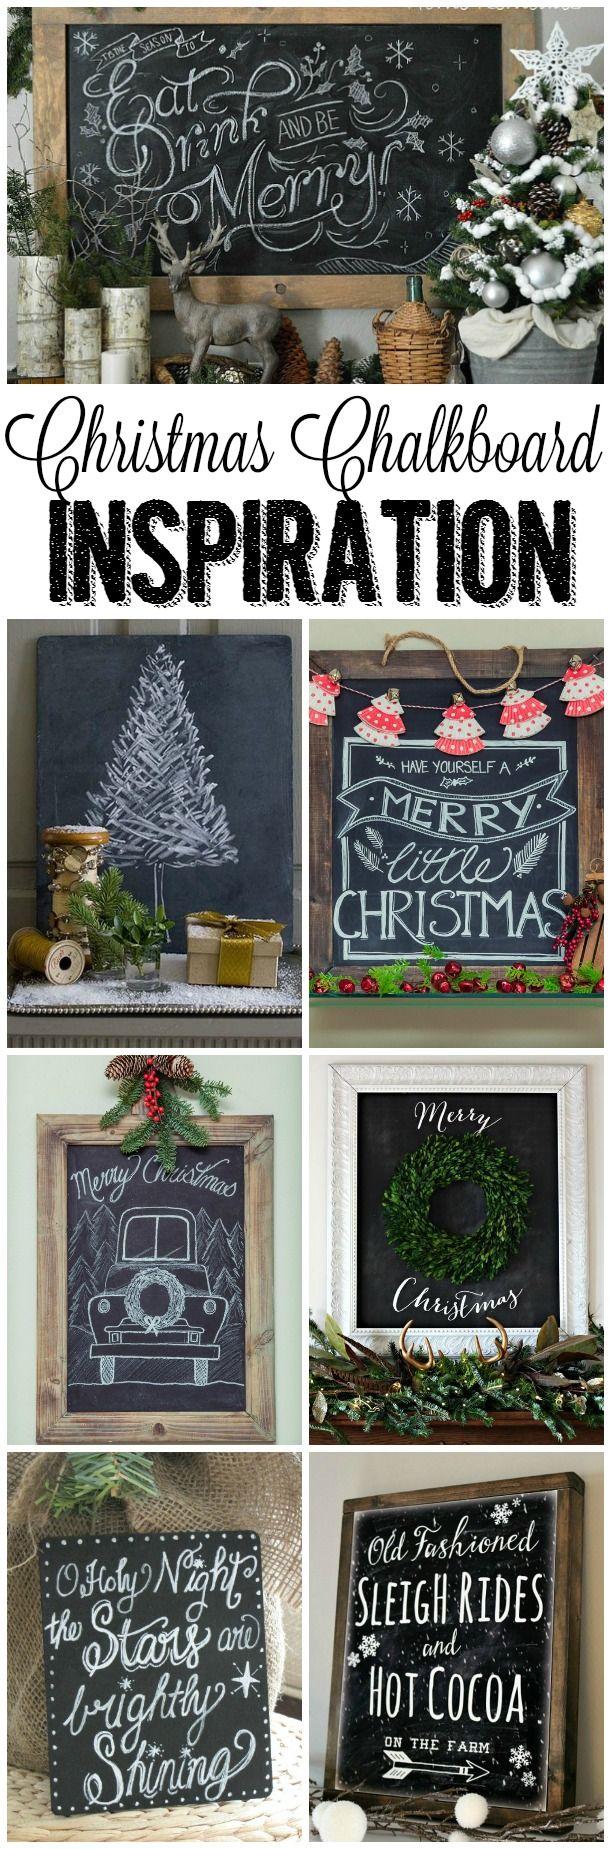 beautiful Christmas decor | decor ideas for Christmas | Christmas decor ideas | Christmas Season | farmhouse christmas | beautiful Christmas chalkboards